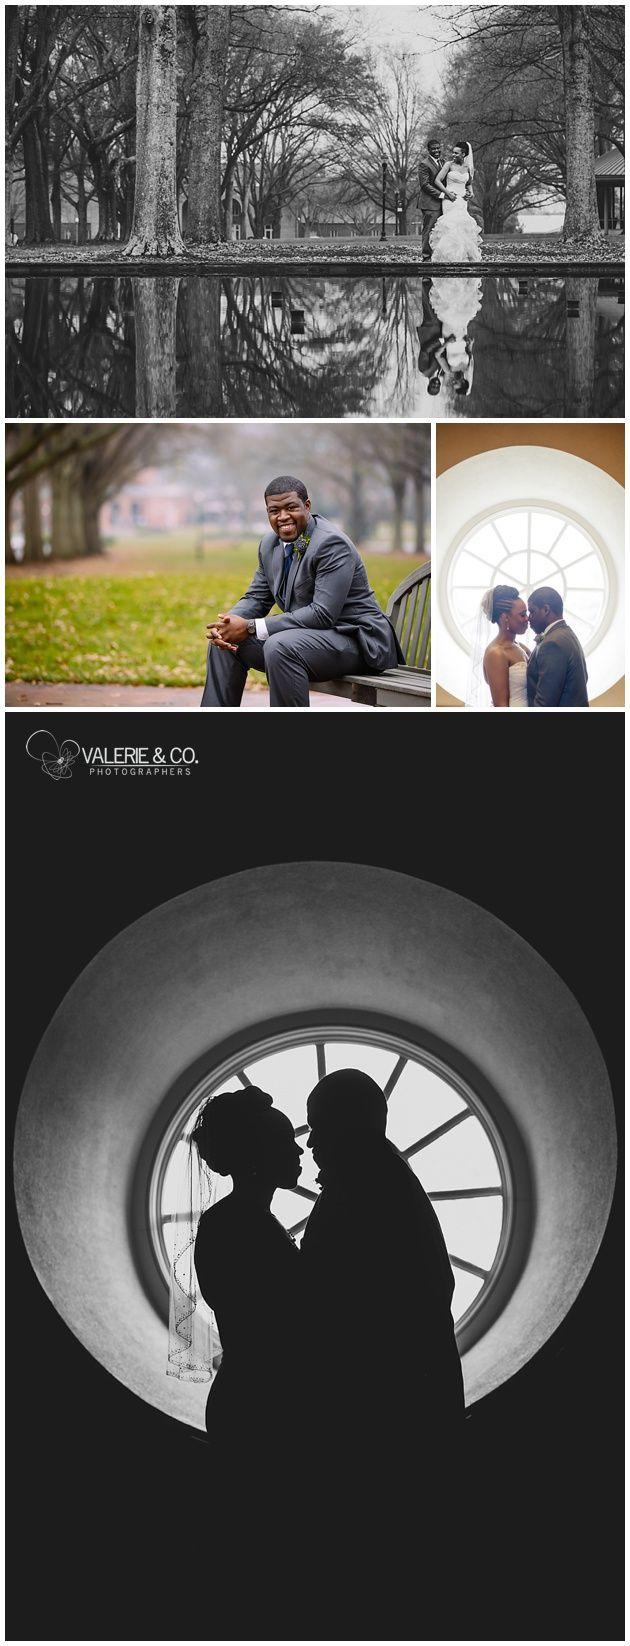 Furman University Wedding - Greenville, South Carolina - Charleston Wedding Photography - by Valerie & Co. Photographers, www.valerieandco.com